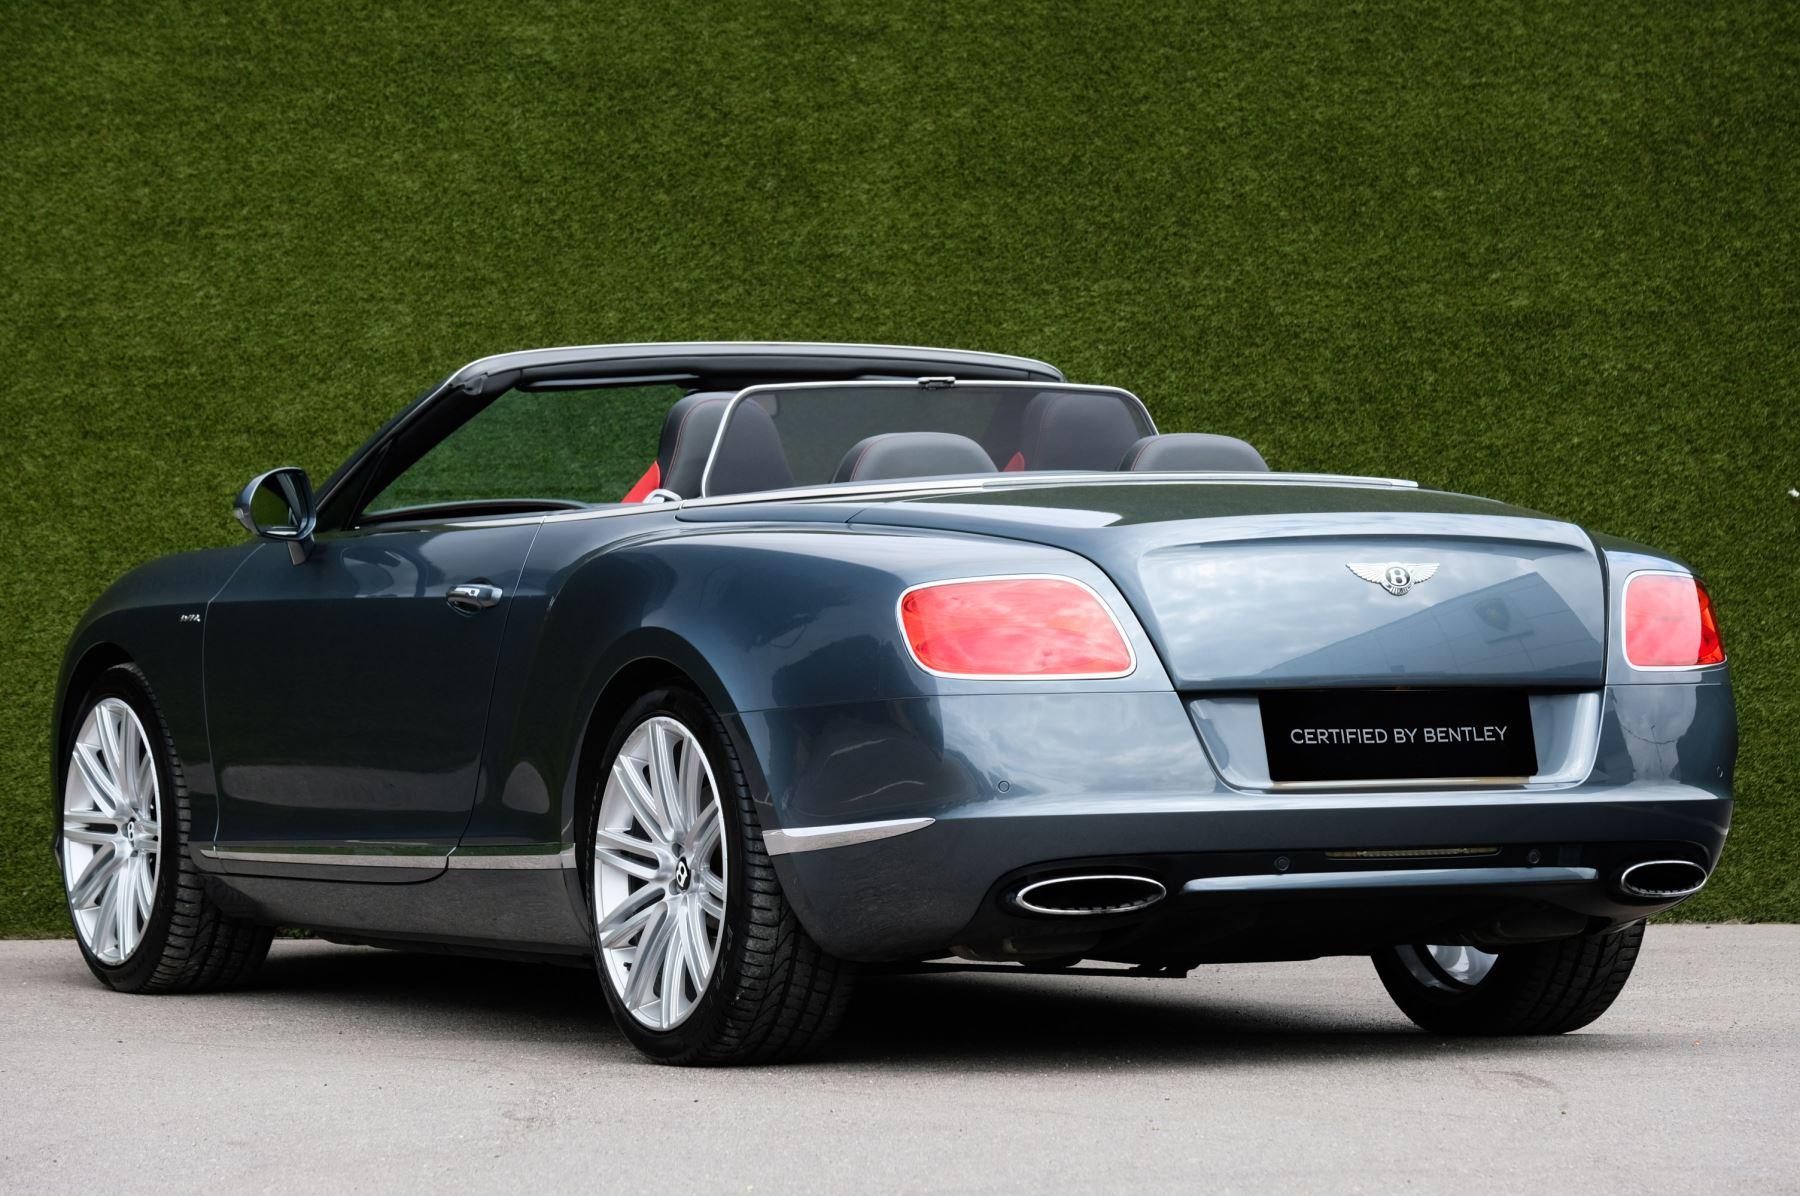 Bentley Continental GTC 6.0 W12 Speed - Massage Seats & Ventilation - Neck Warmer - Rear View Camera image 5